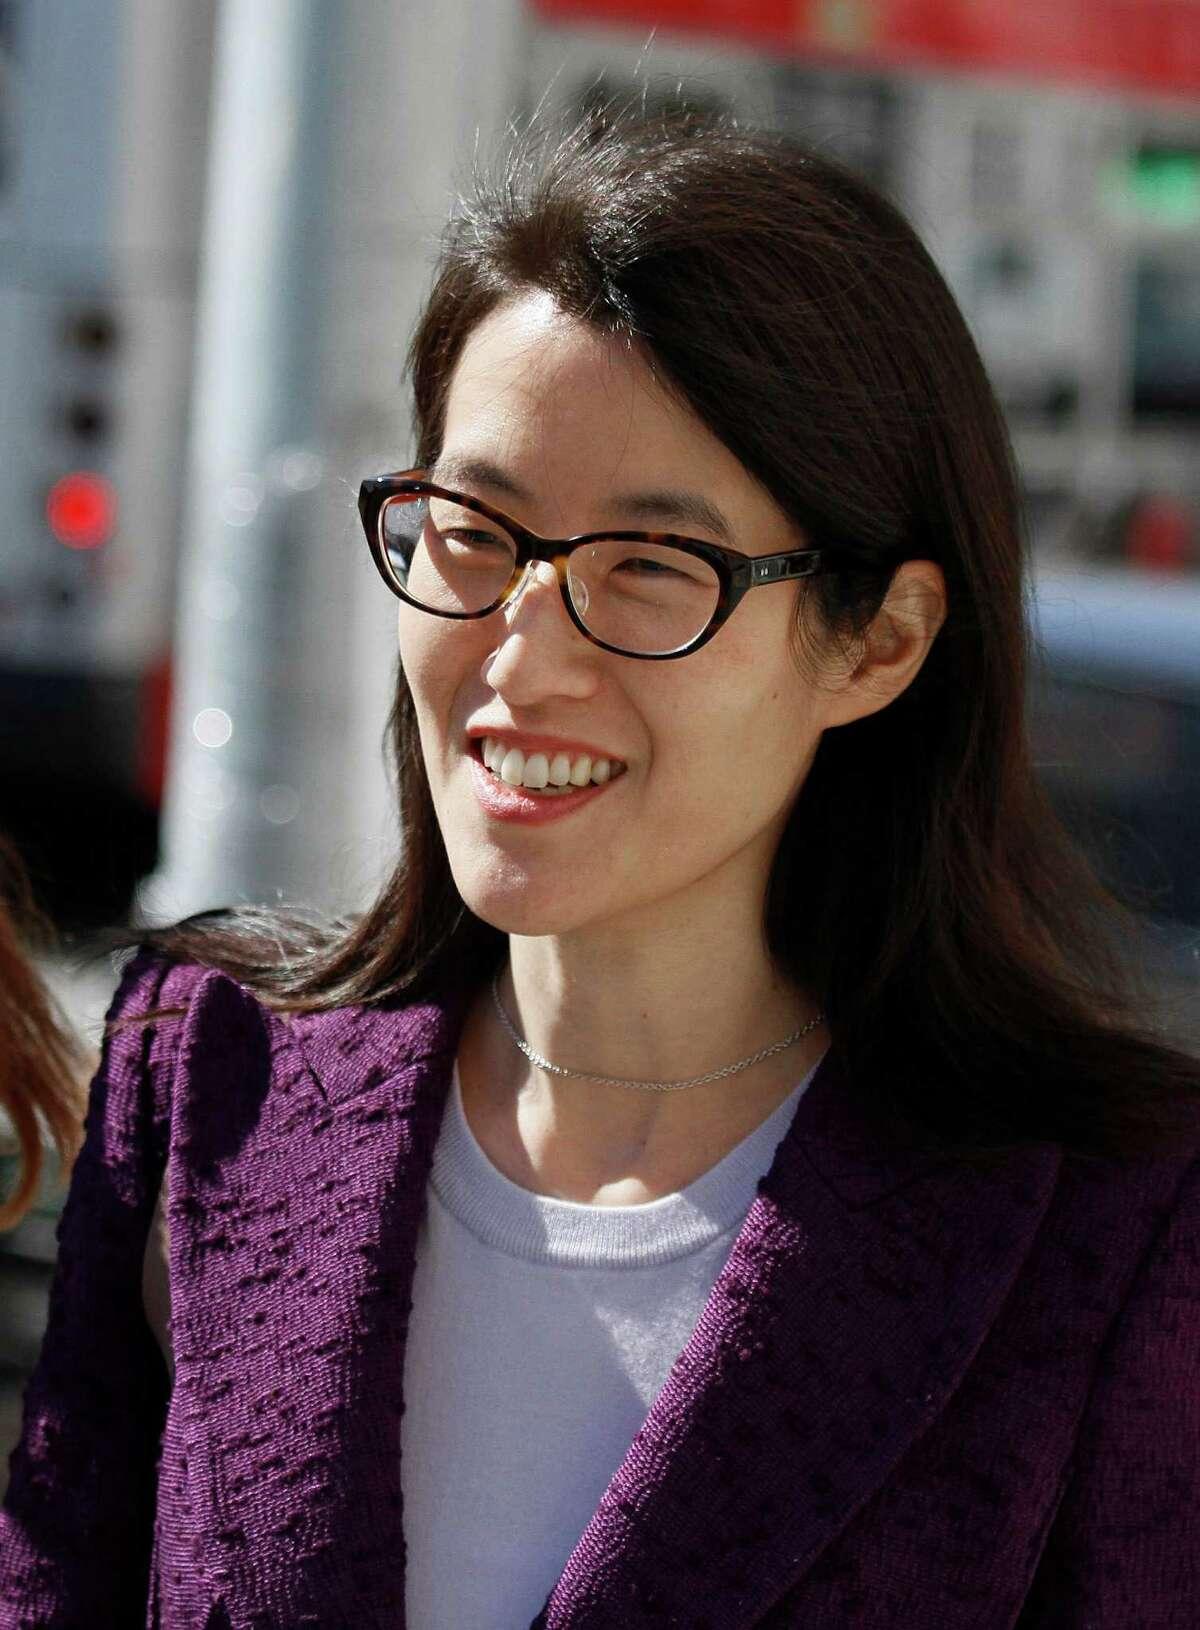 Ellen Pao is suing Kleiner Perkins for $16 million in a high-profile gender bias case.